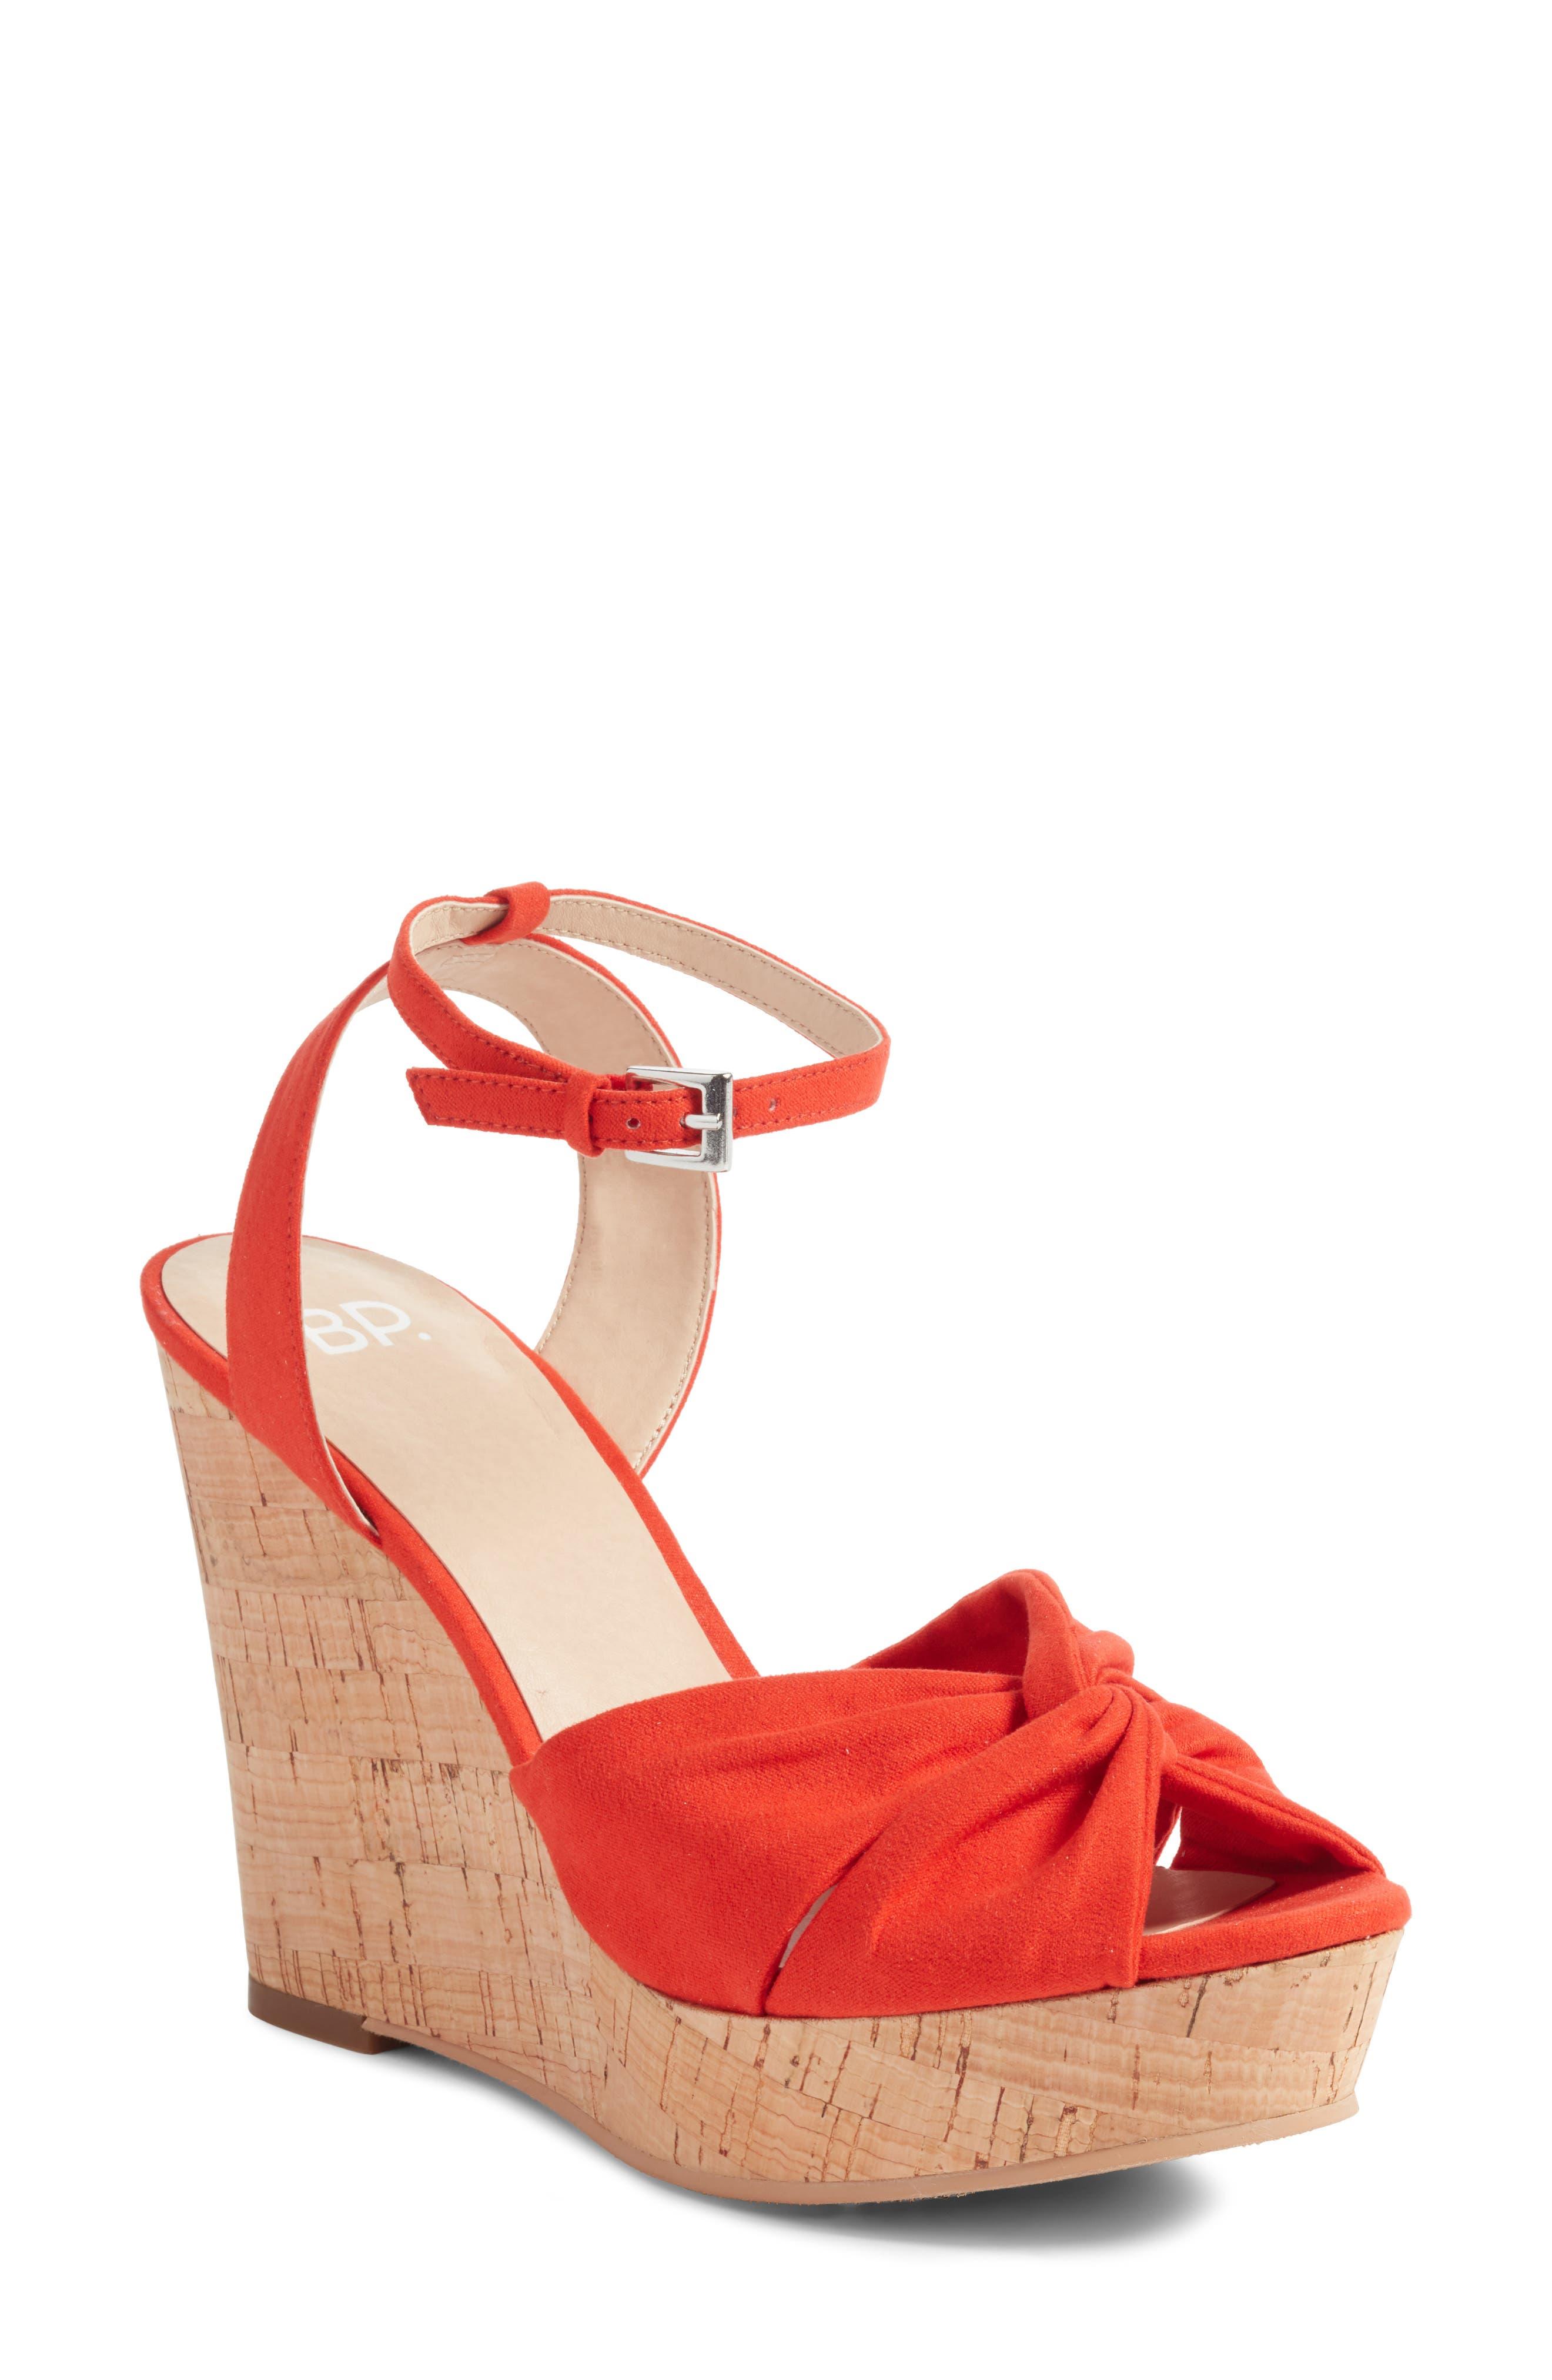 Arya Platform Wedge Sandal,                             Main thumbnail 6, color,